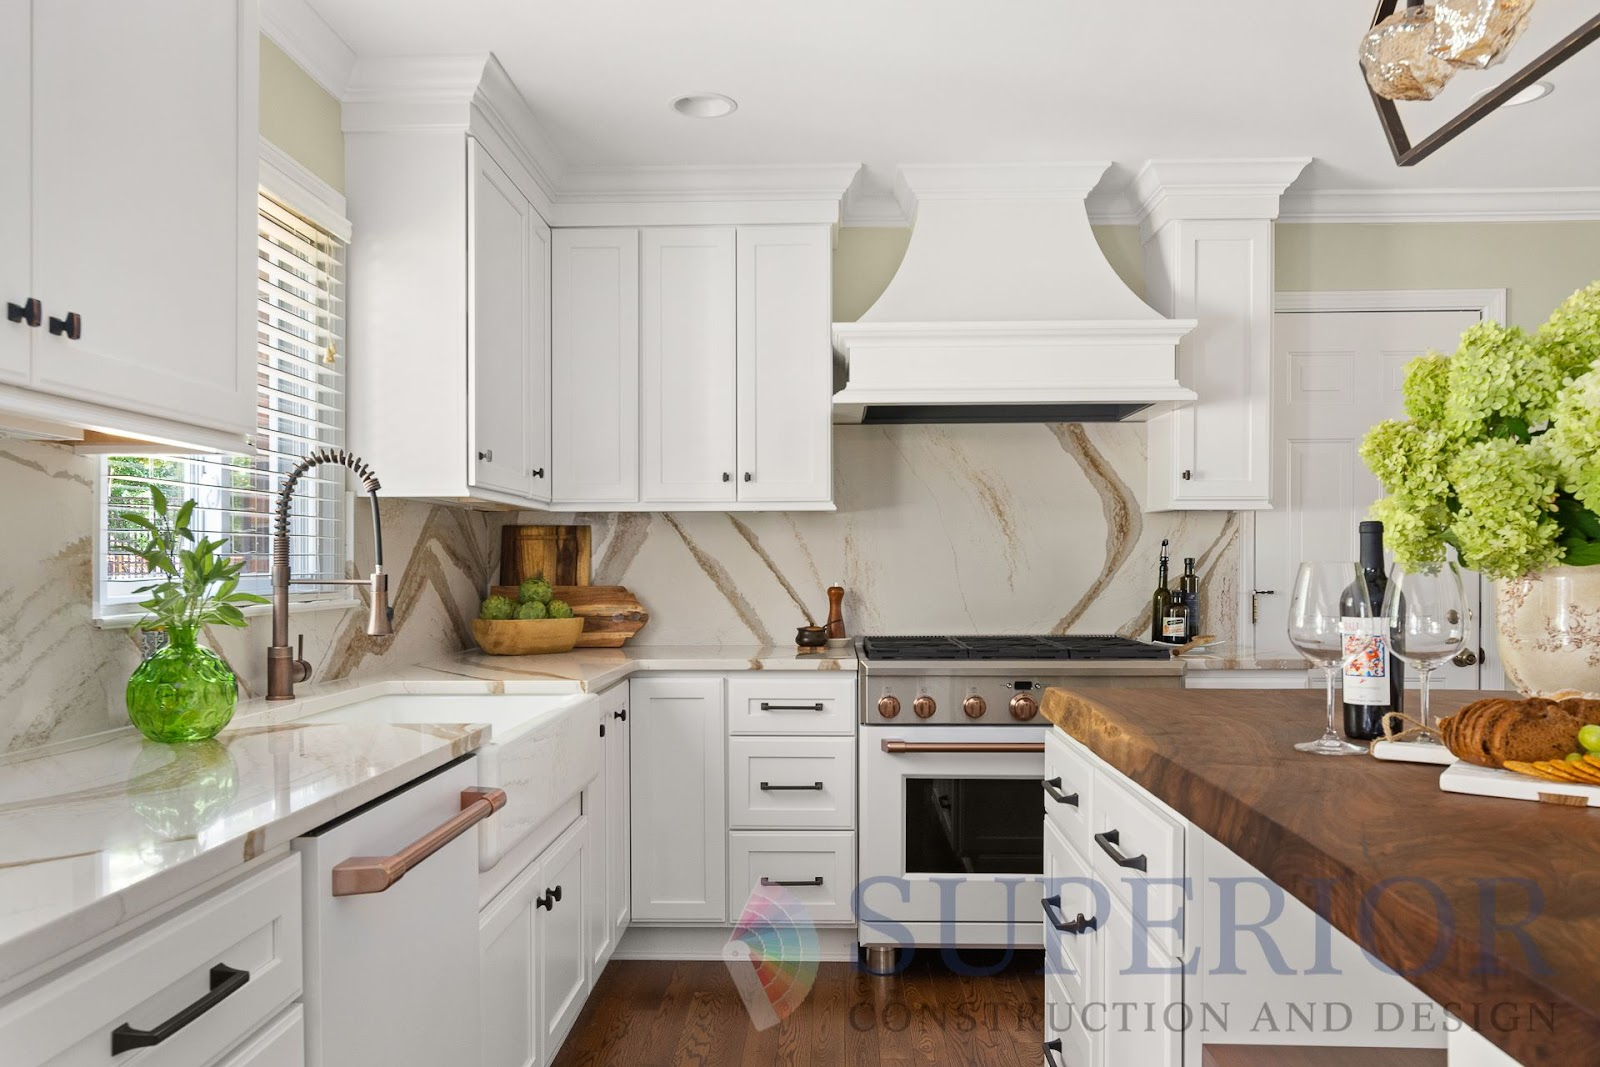 superior-construction-lebanon-tn-designer-showrooms-white-kitchen-with-natural-island-countertop